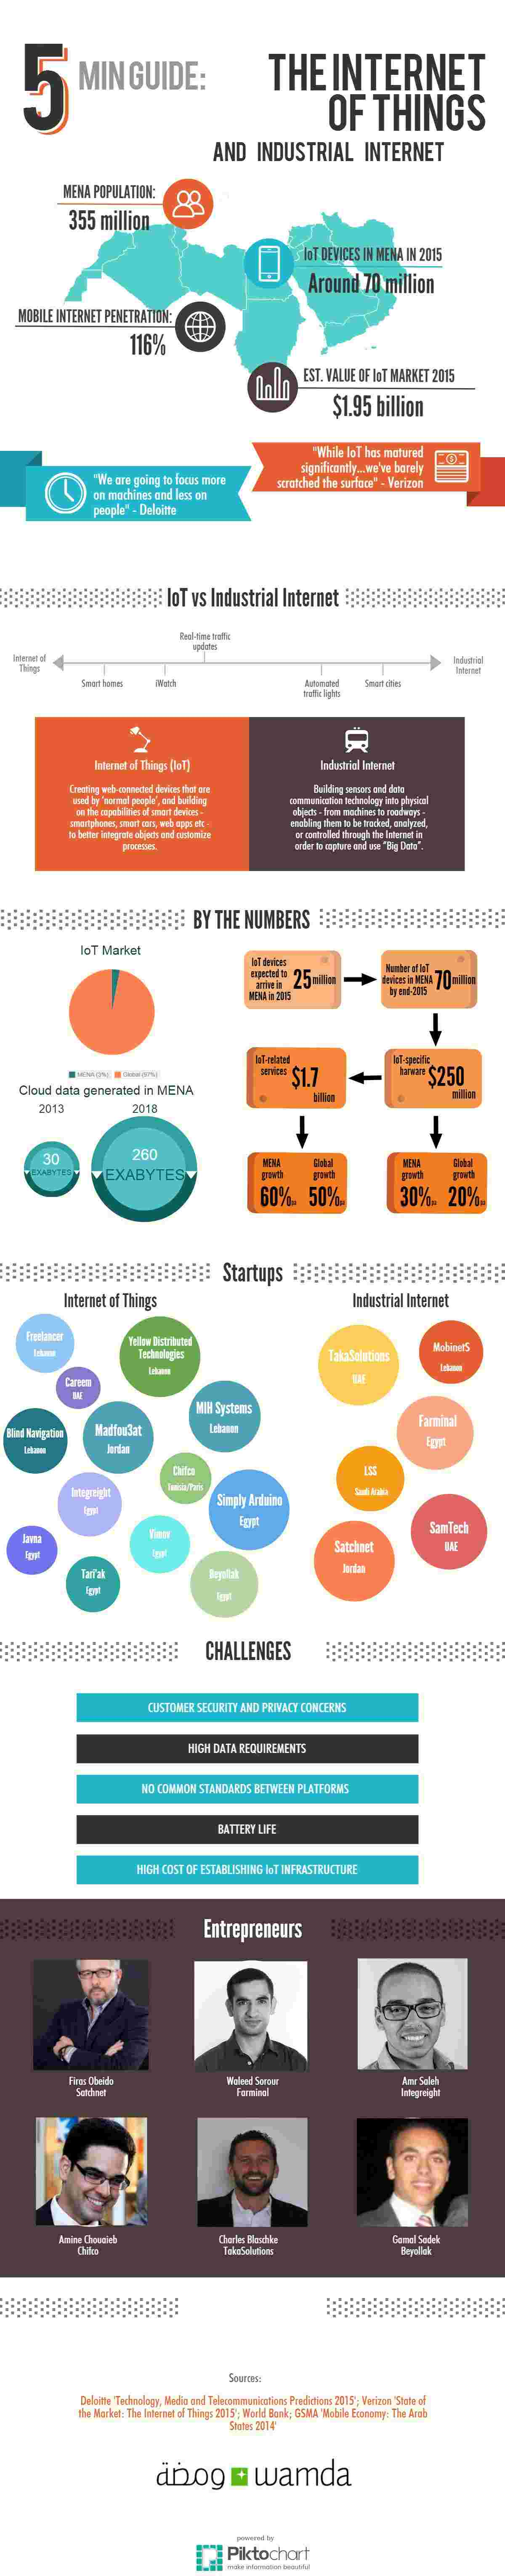 Infographie IoT ET INTERNET